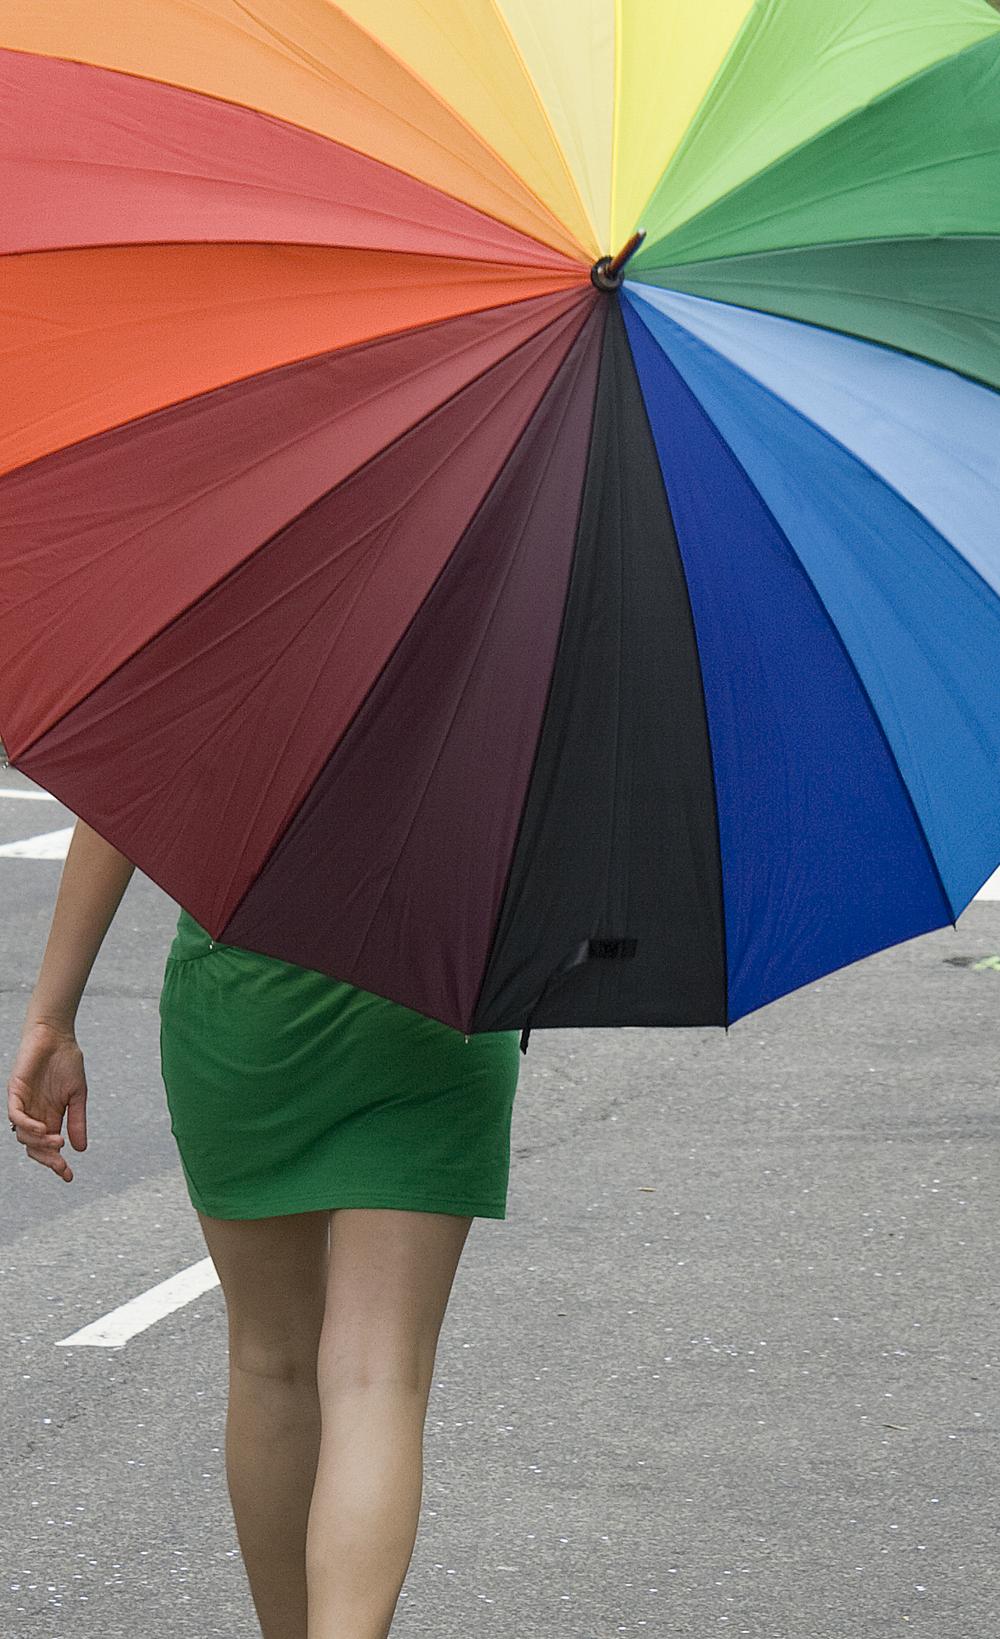 Flowerbrella.jpg